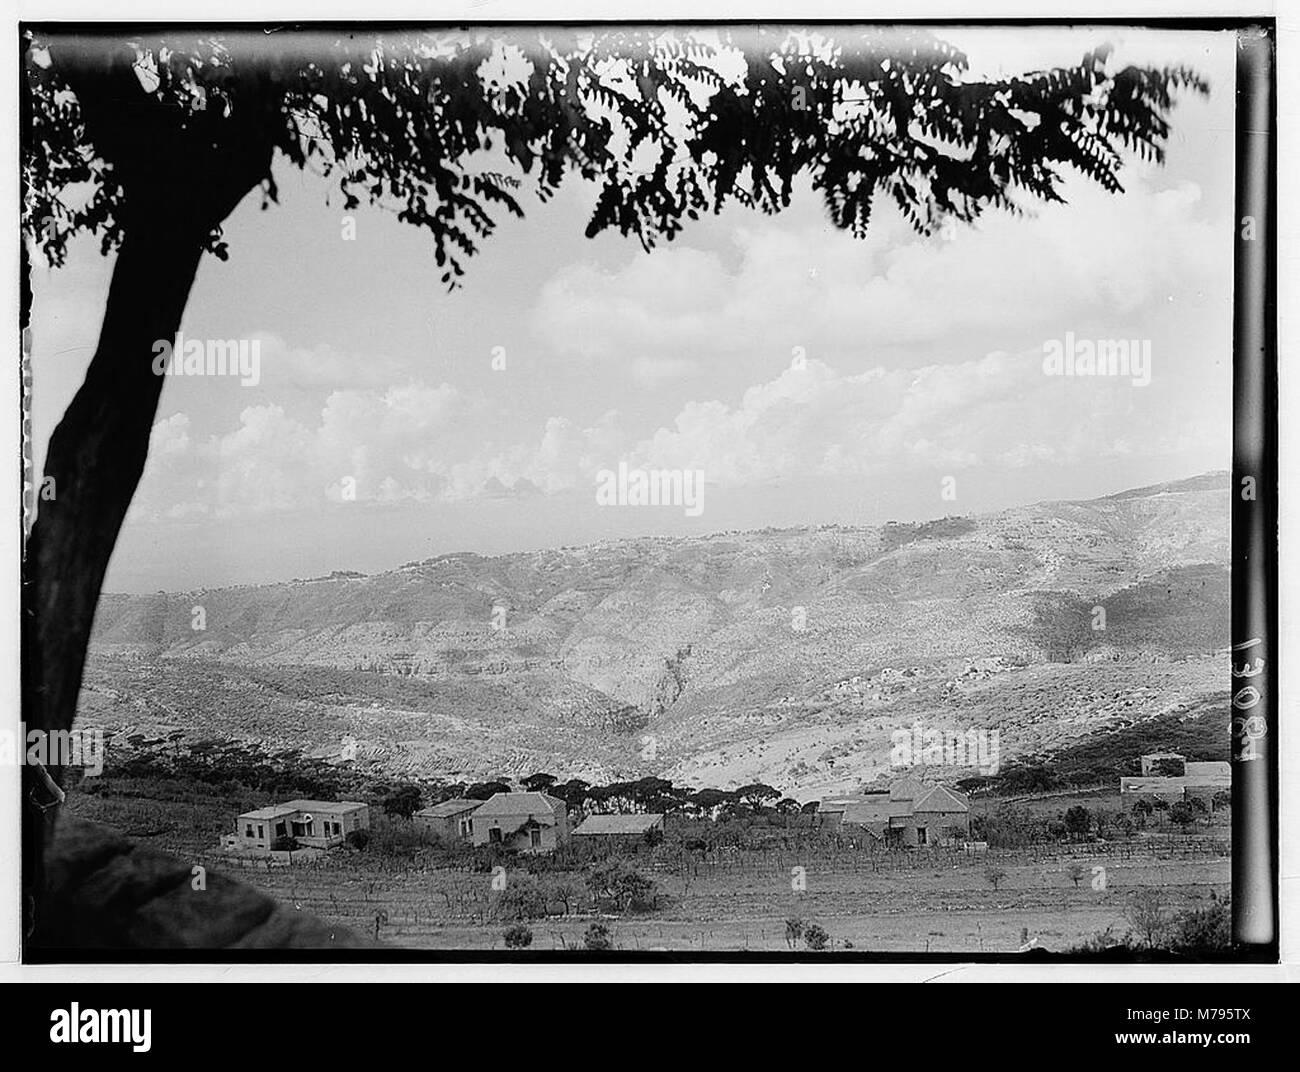 Beit Meri & Poroummana (i.e., Brummna) from Ras-el-Matn LOC matpc.00562 - Stock Image